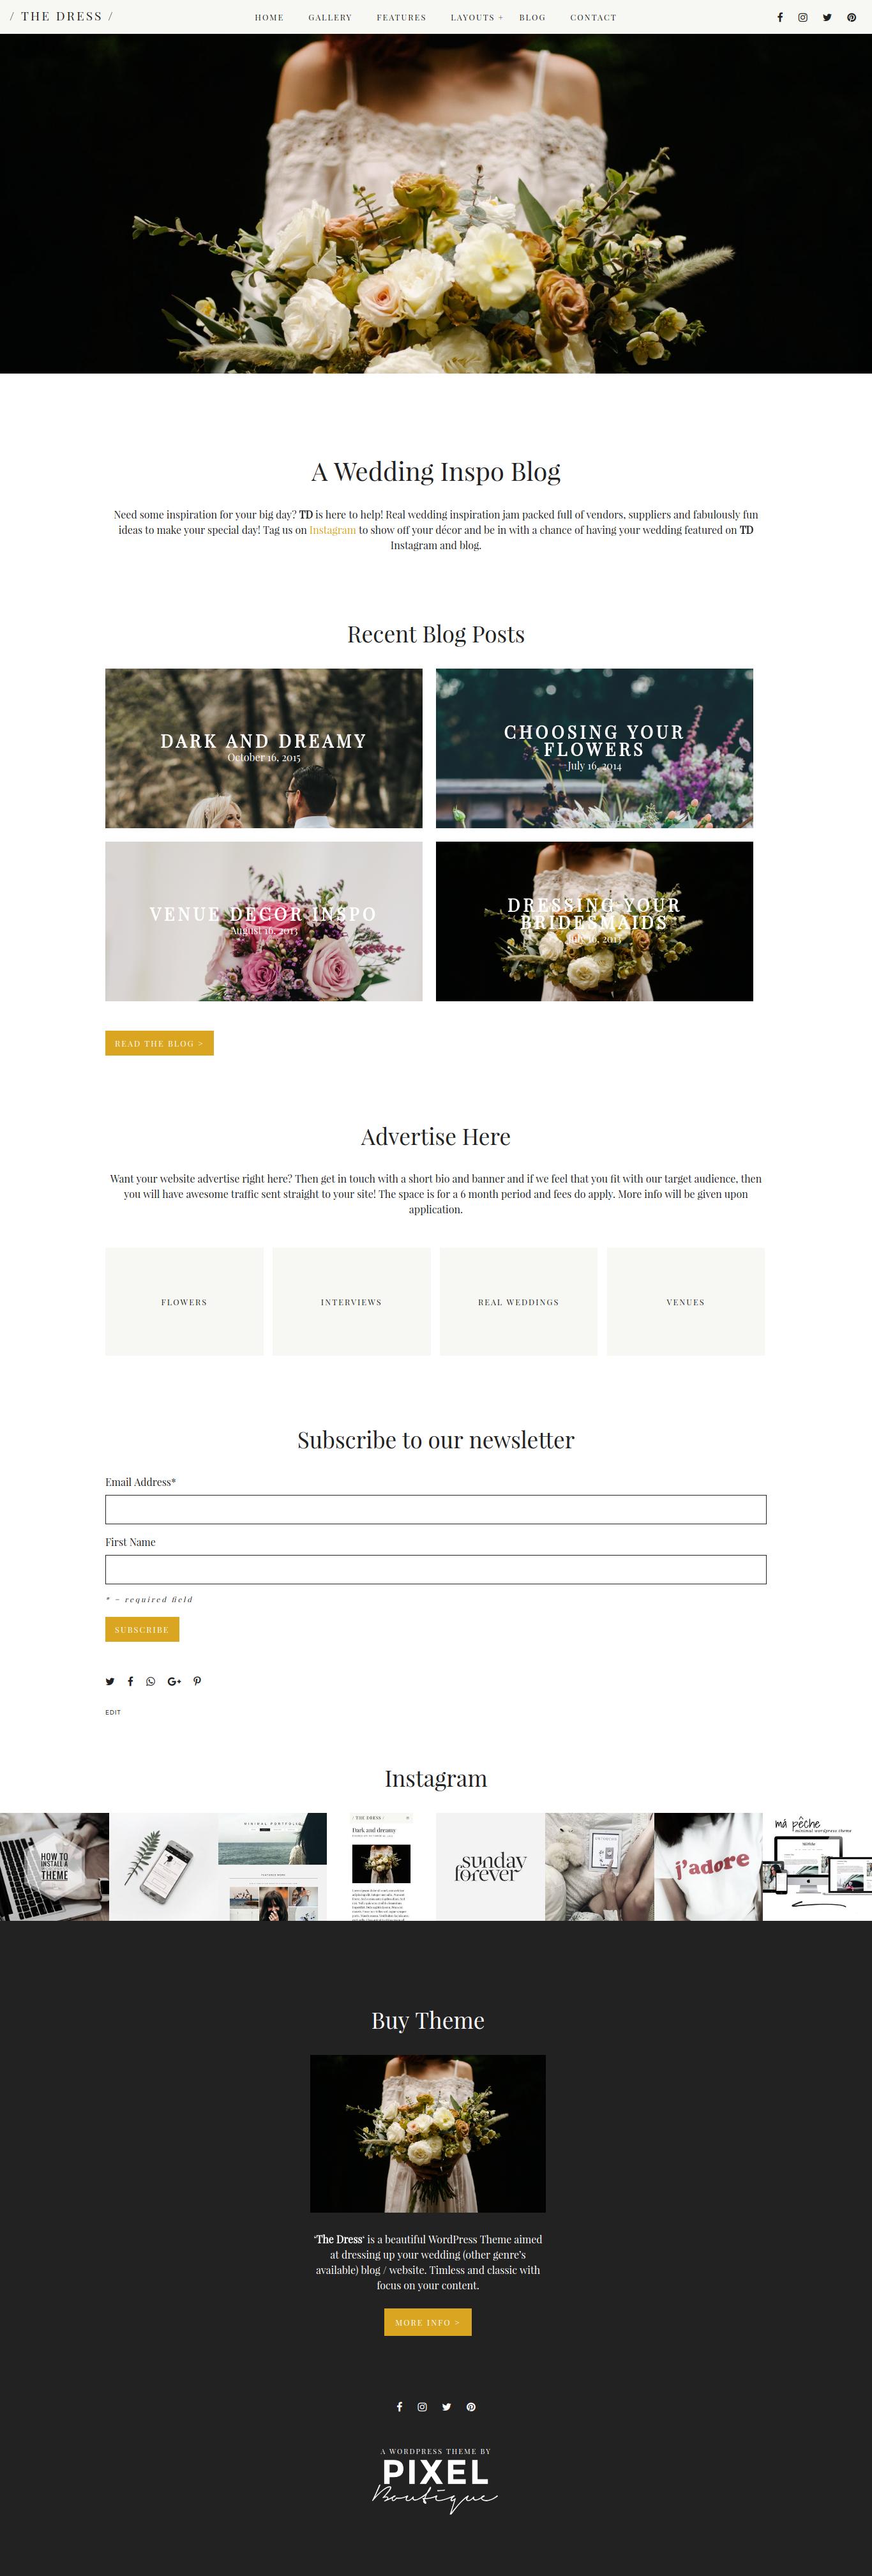 THE DRESS Wedding Blog WordPress Theme #Wedding #Blog #Bride ...